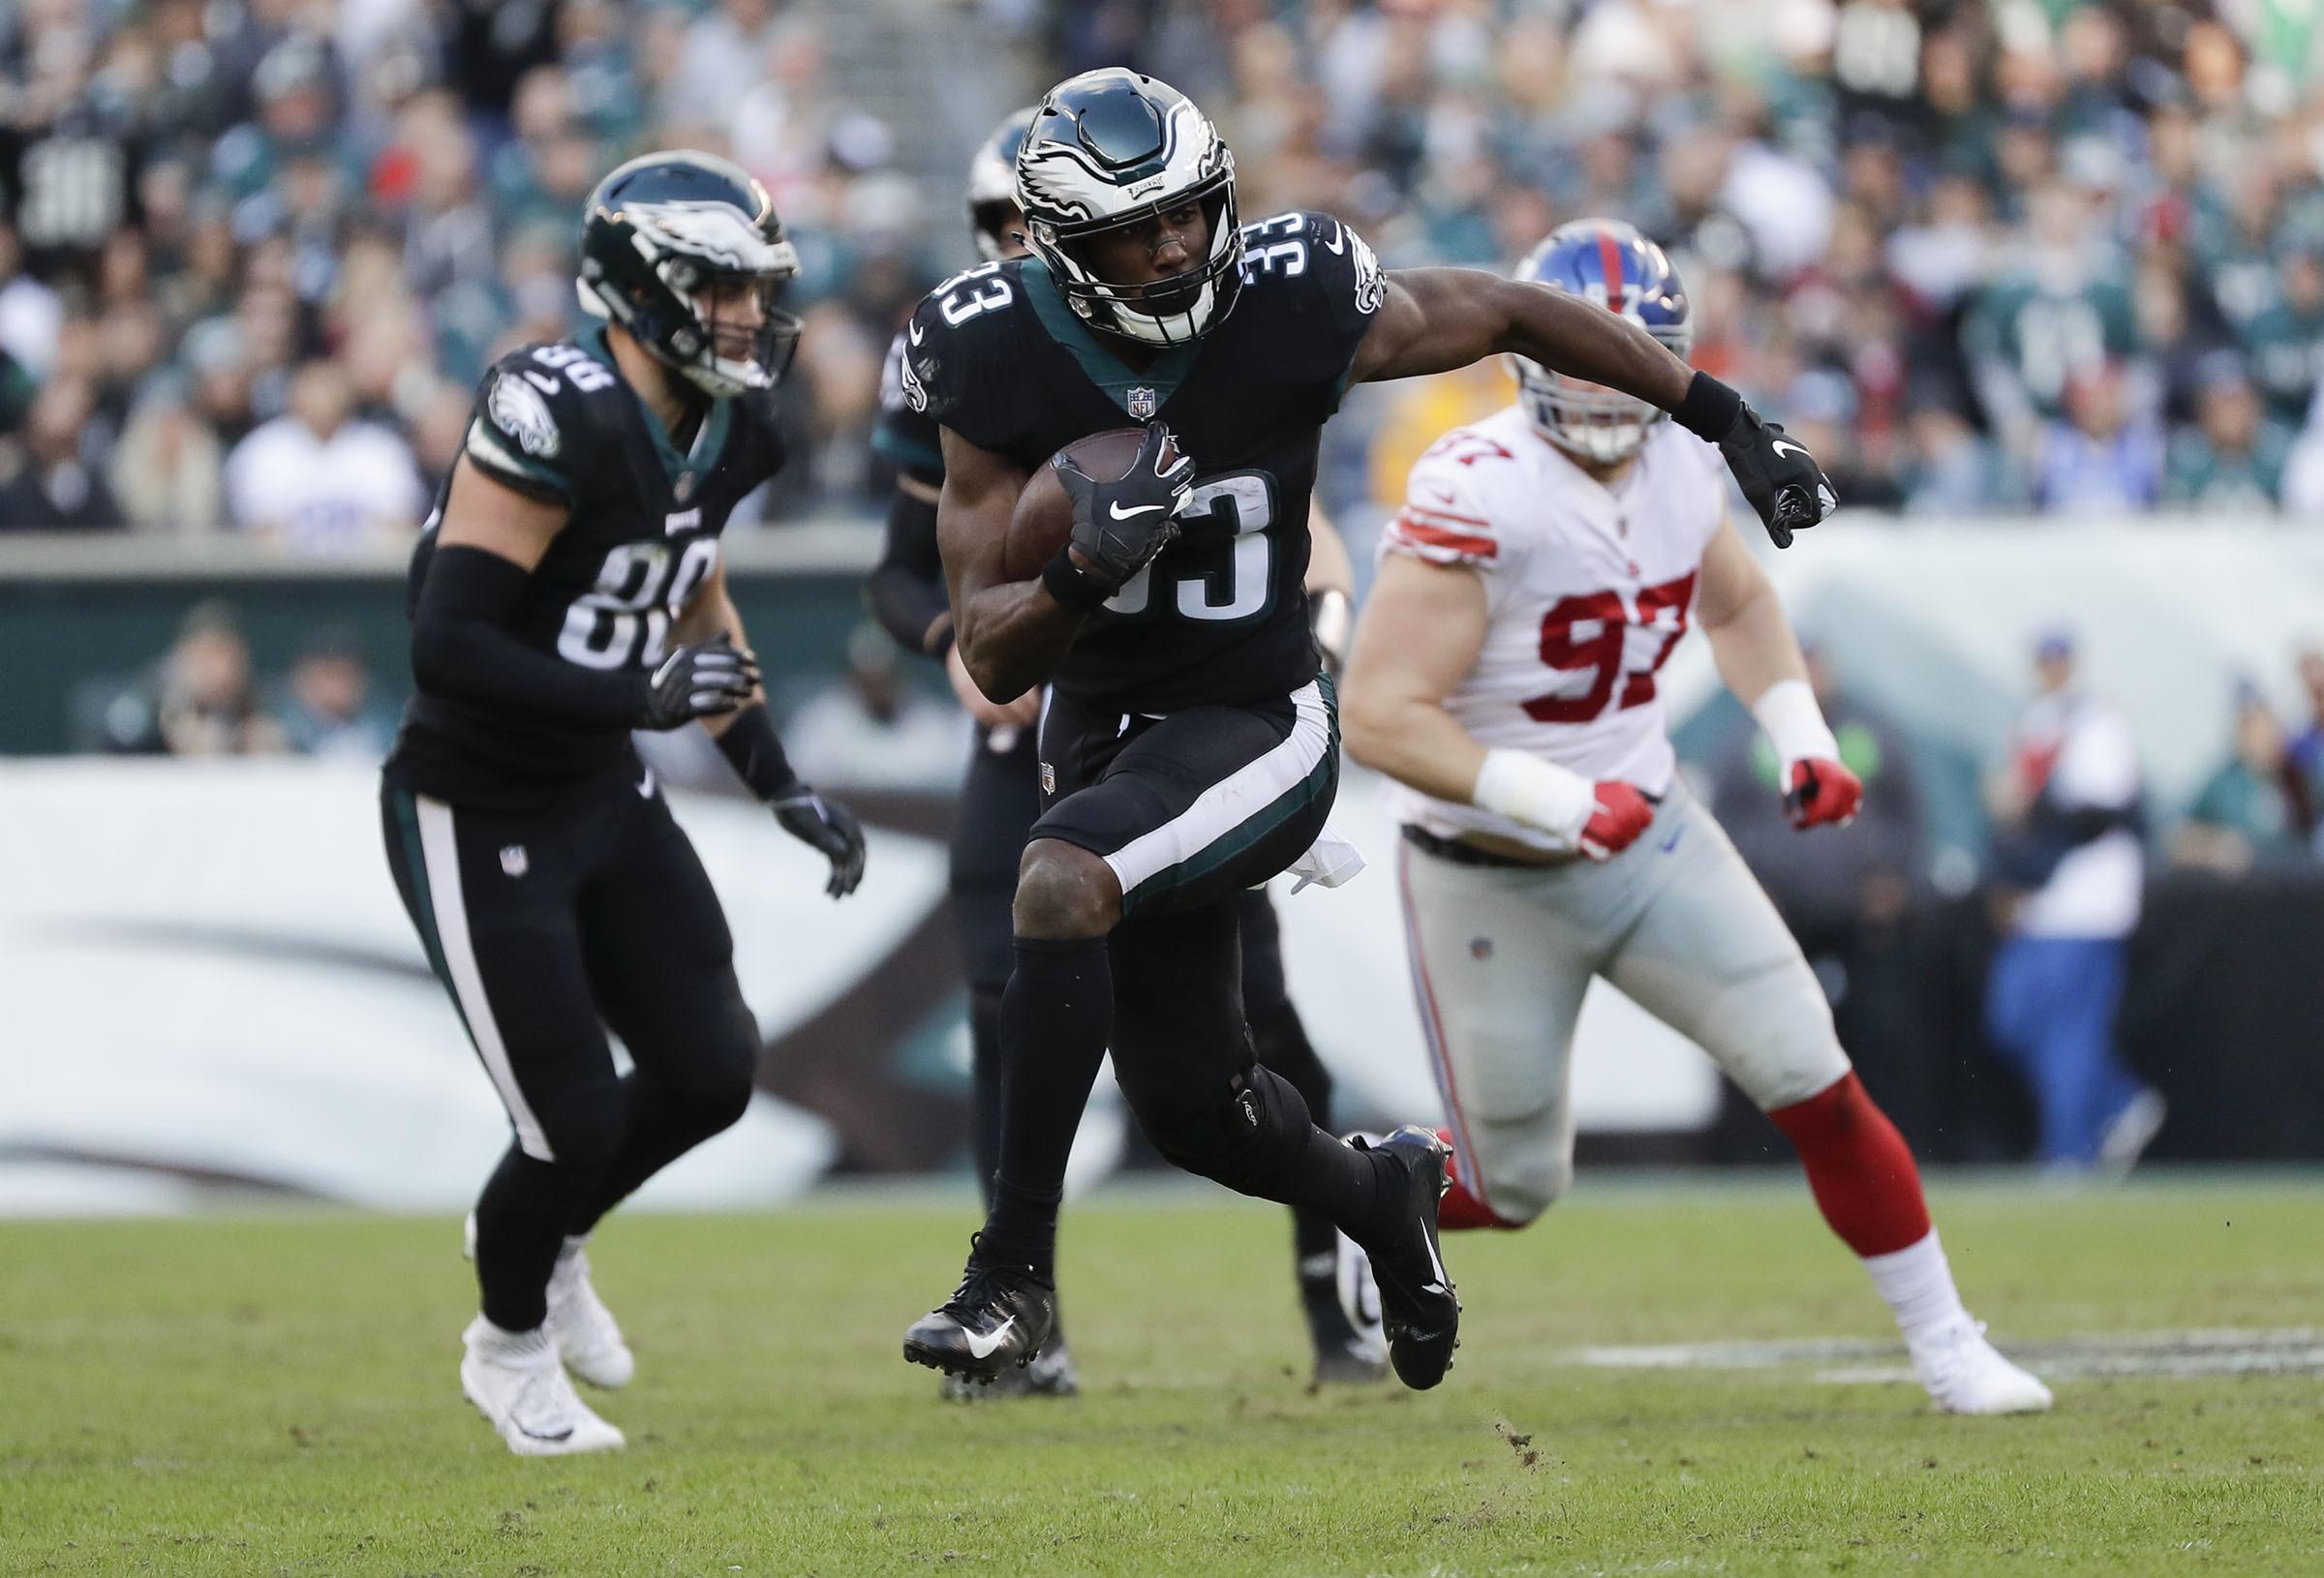 Eagles running back Josh Adams runs with the football against the New York Giants on Sunday, November 25, 2018 in Philadelphia.